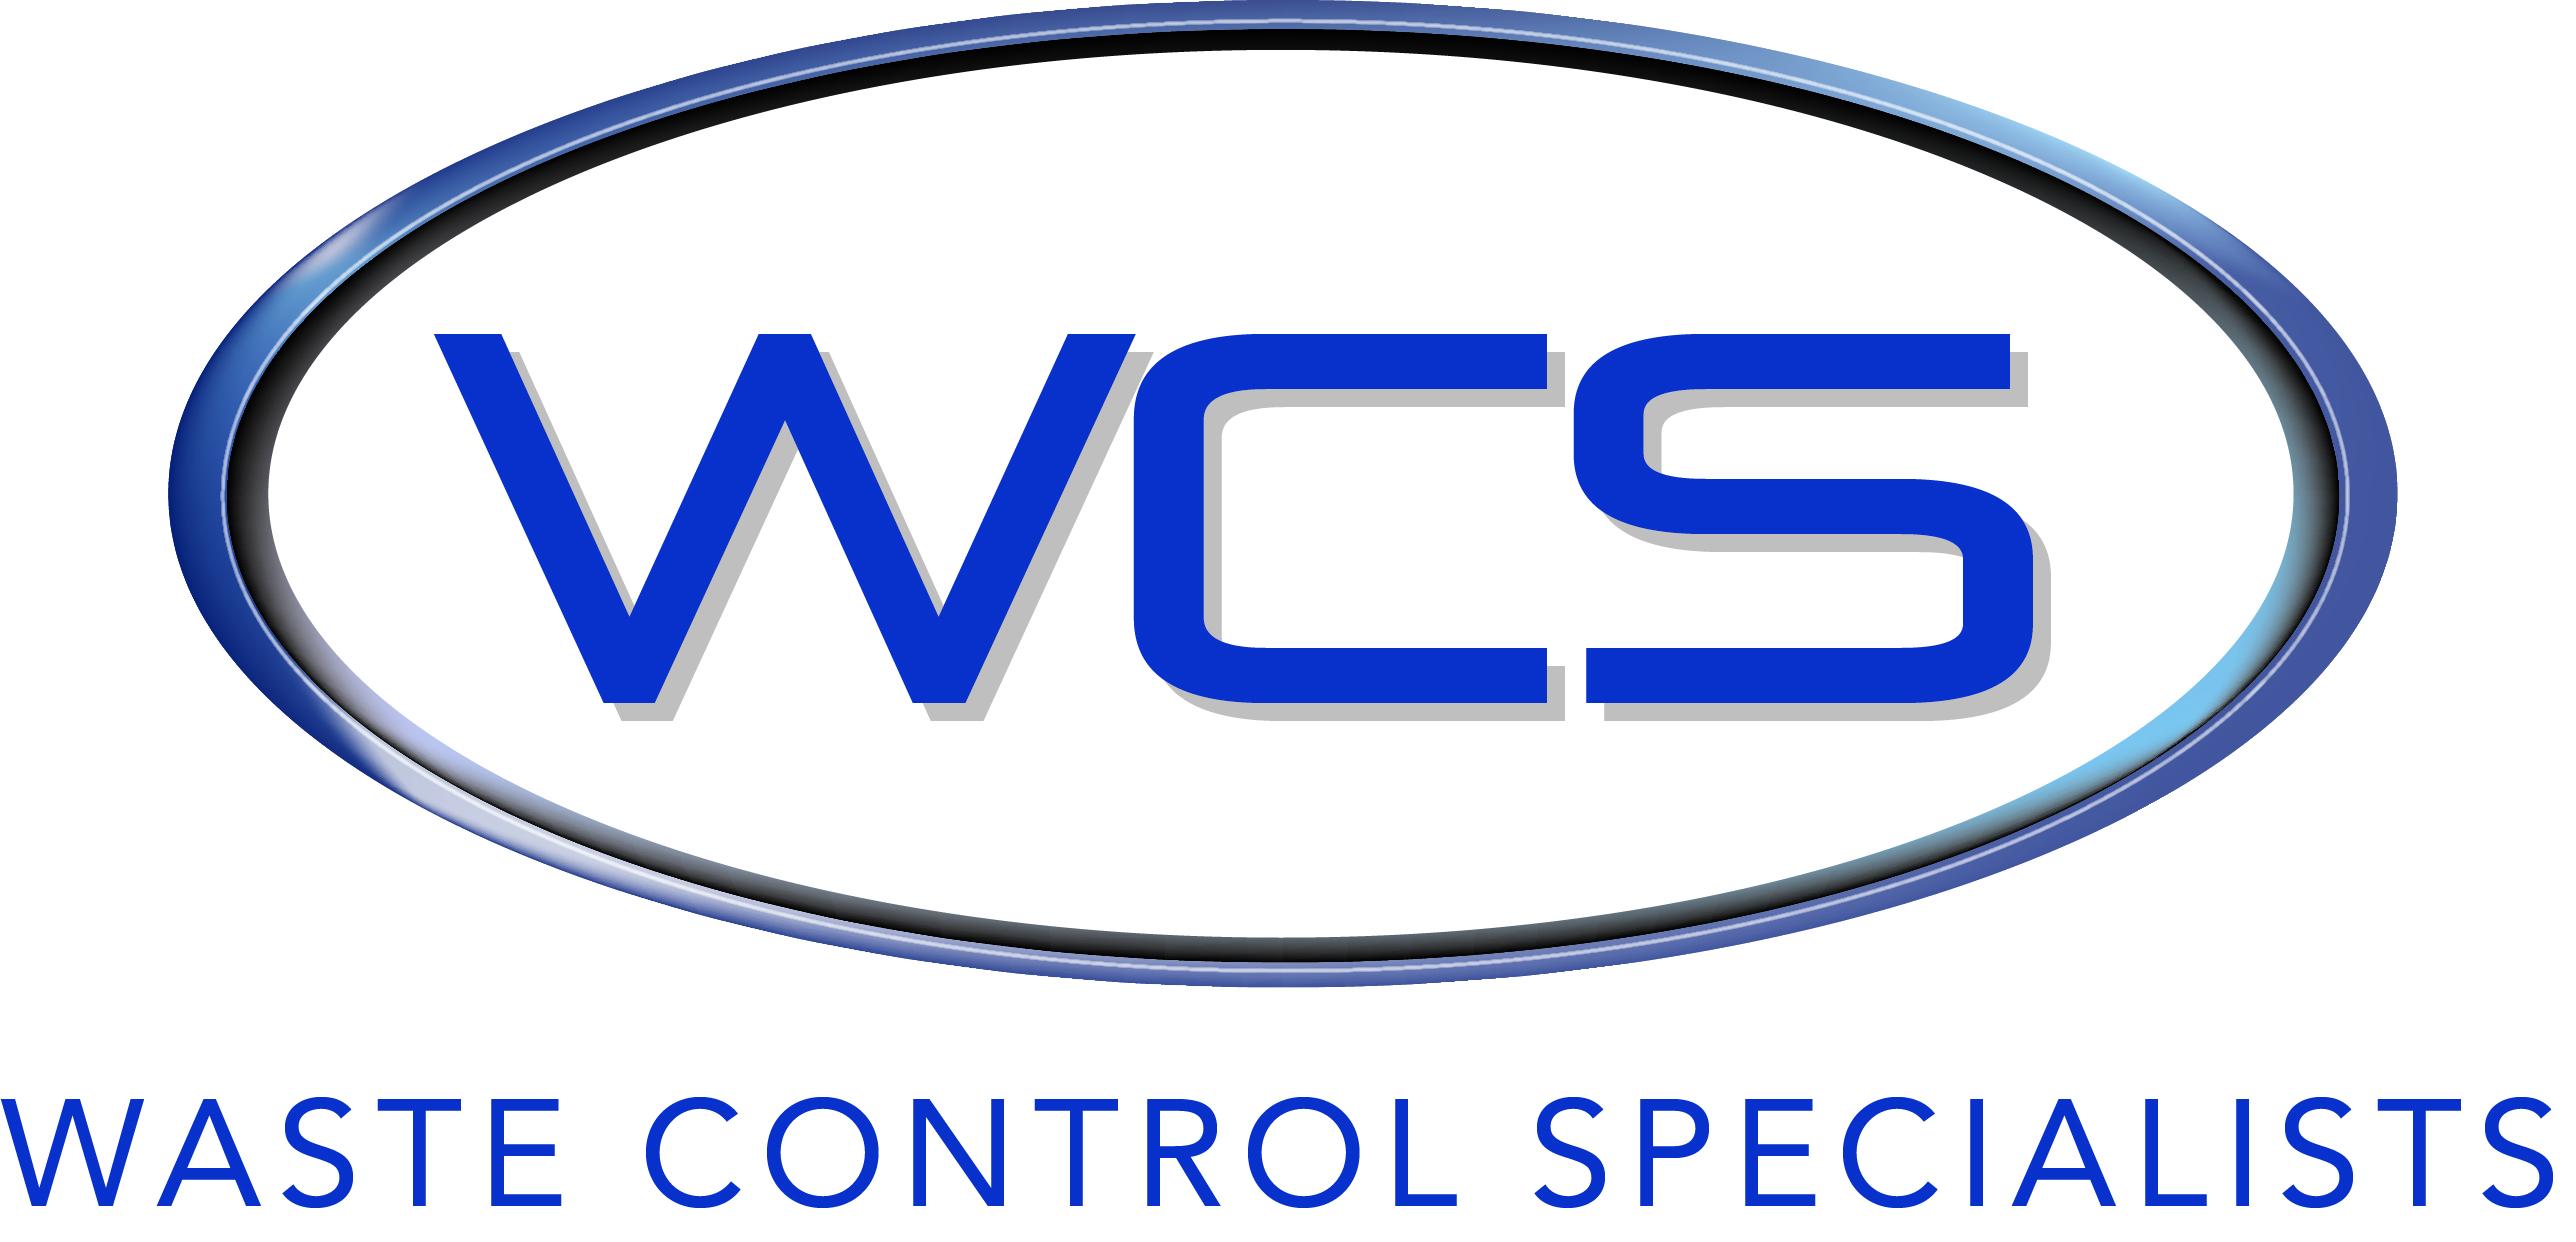 Waste-Control-Specialists-Logo.jpg